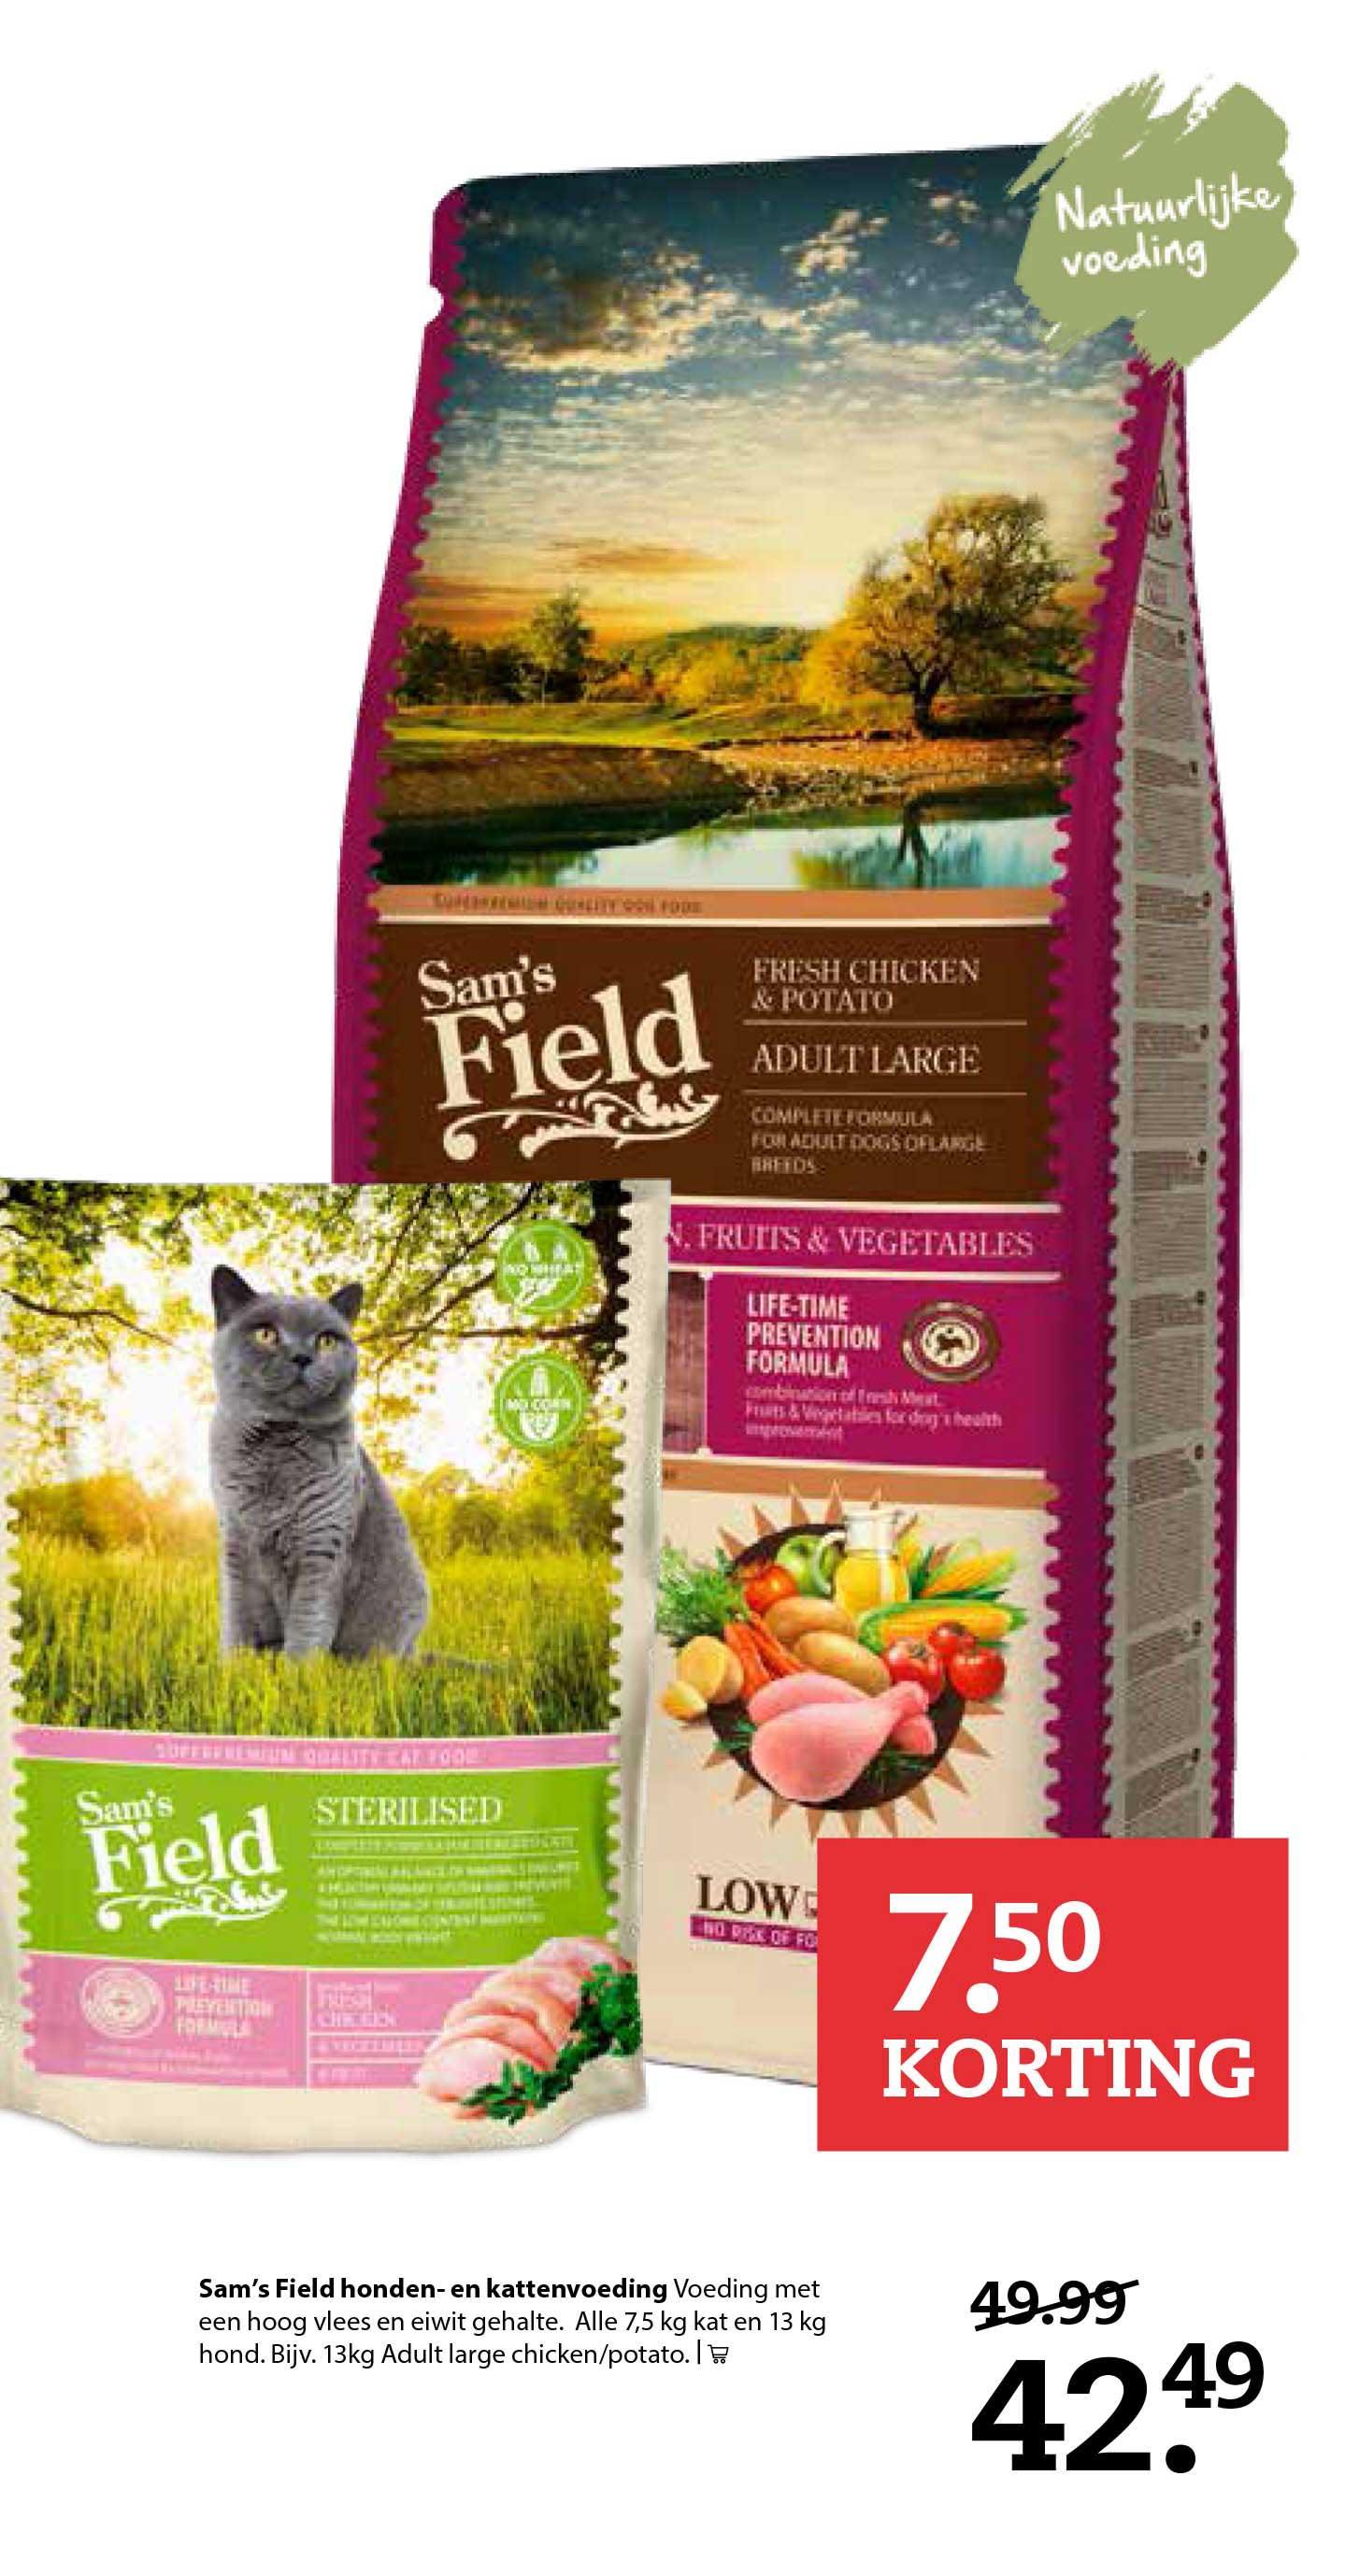 Pets Place Sam's Field Honden En Kattenvoeding: €7,50 Korting